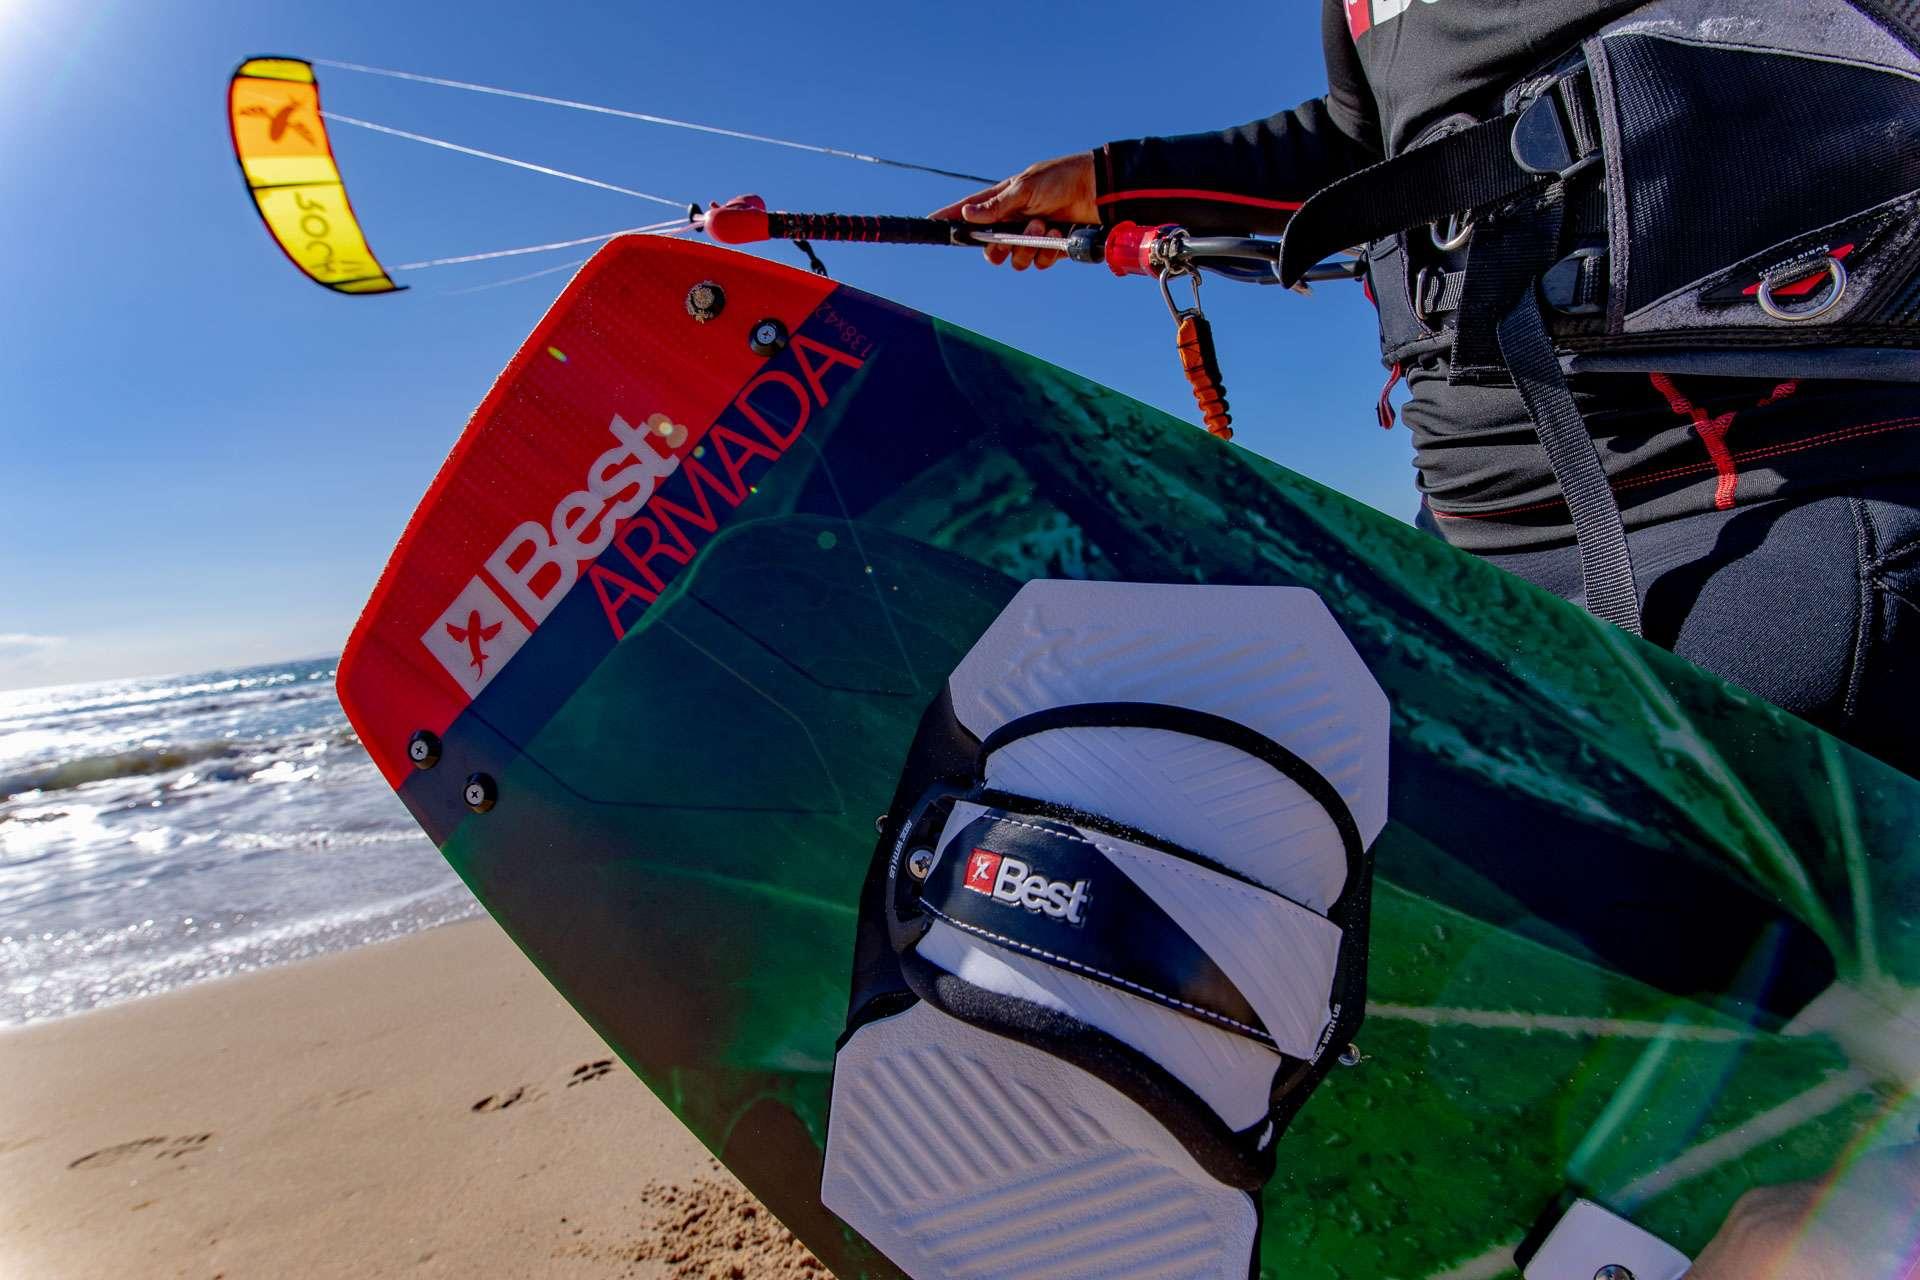 bestkiteboarding kitesurf (511)